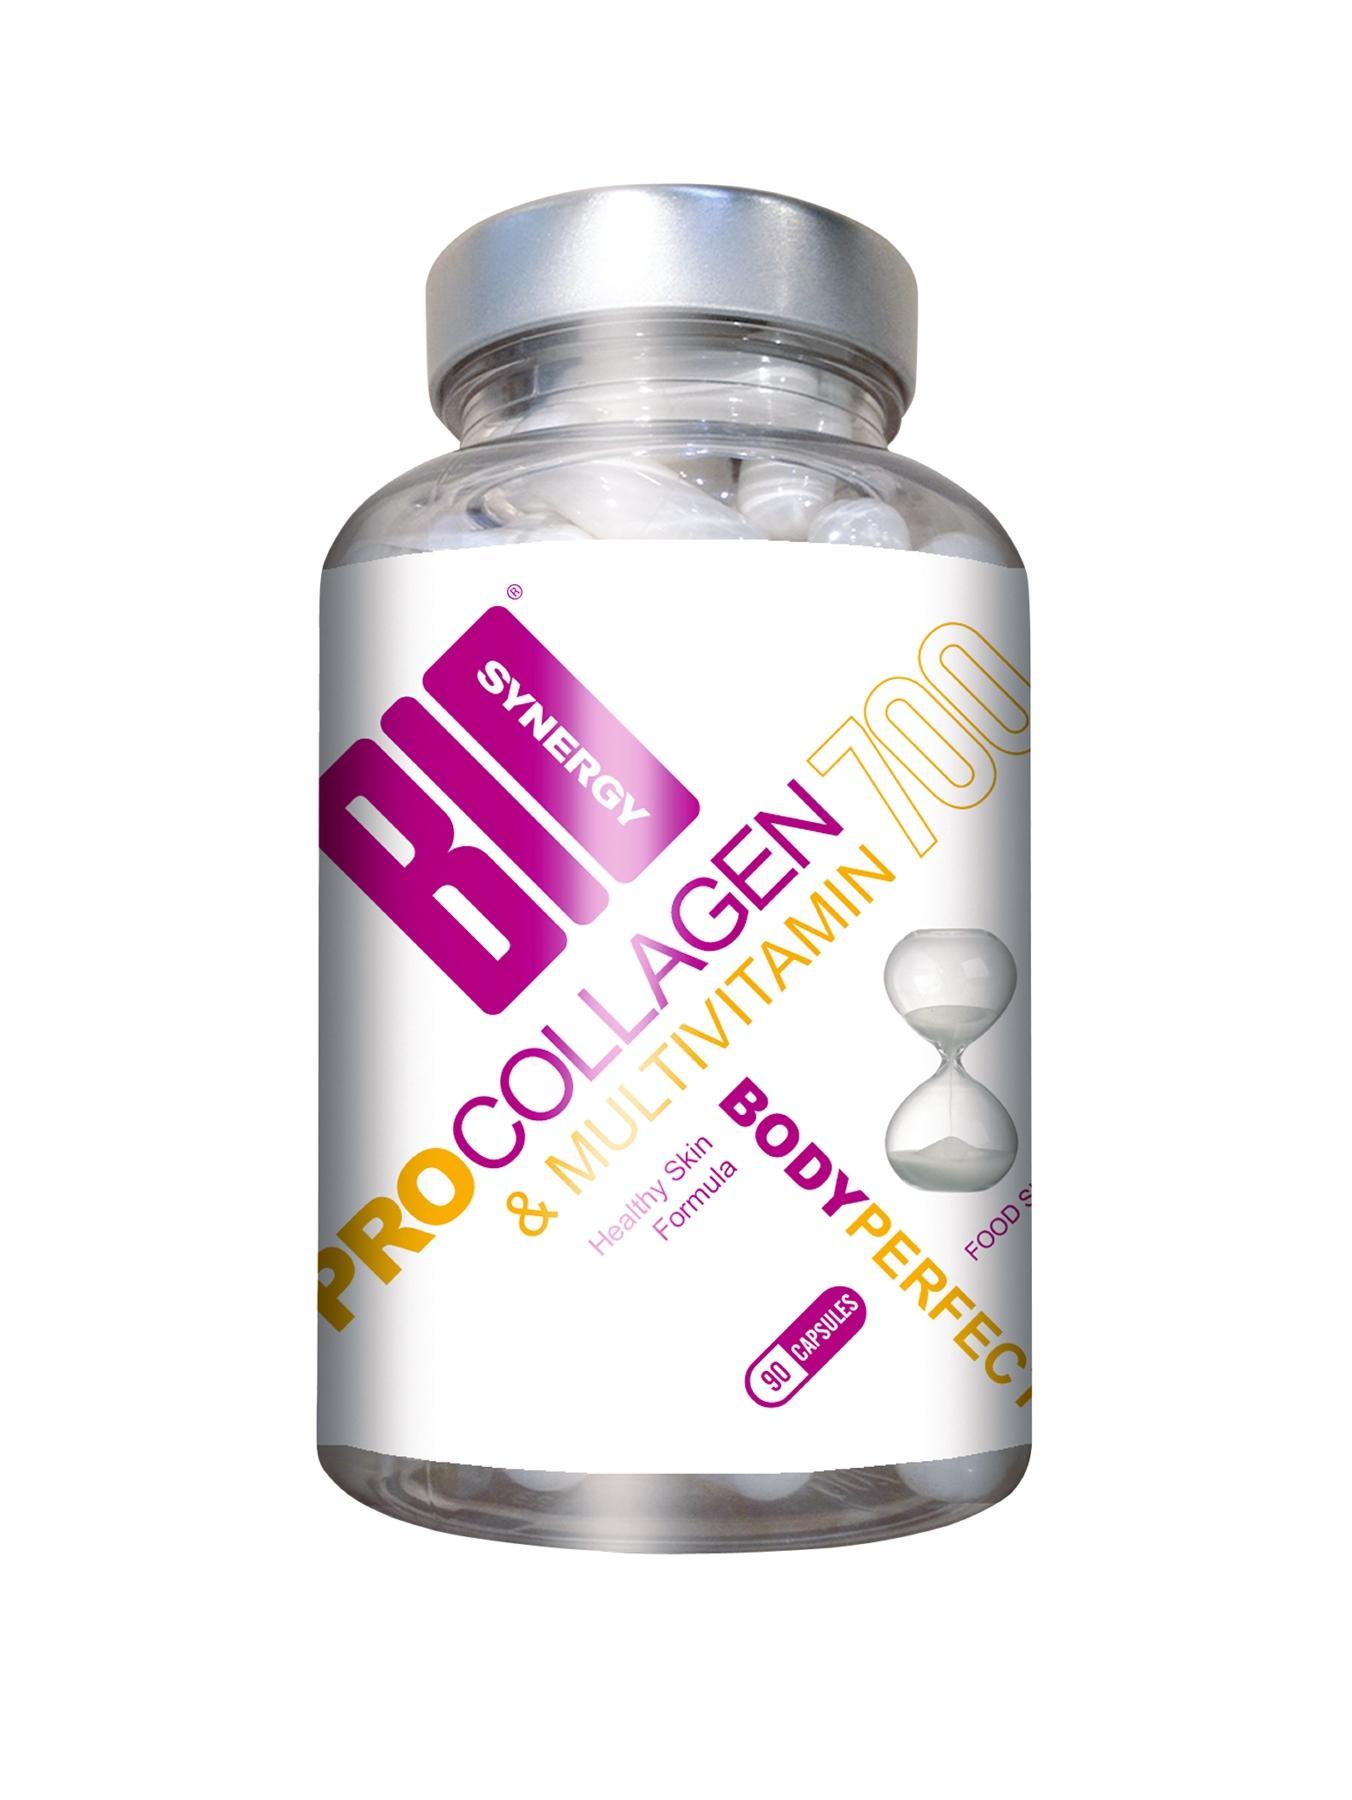 Bio Synergy Collagen Multi Vitamin (90 capsules)